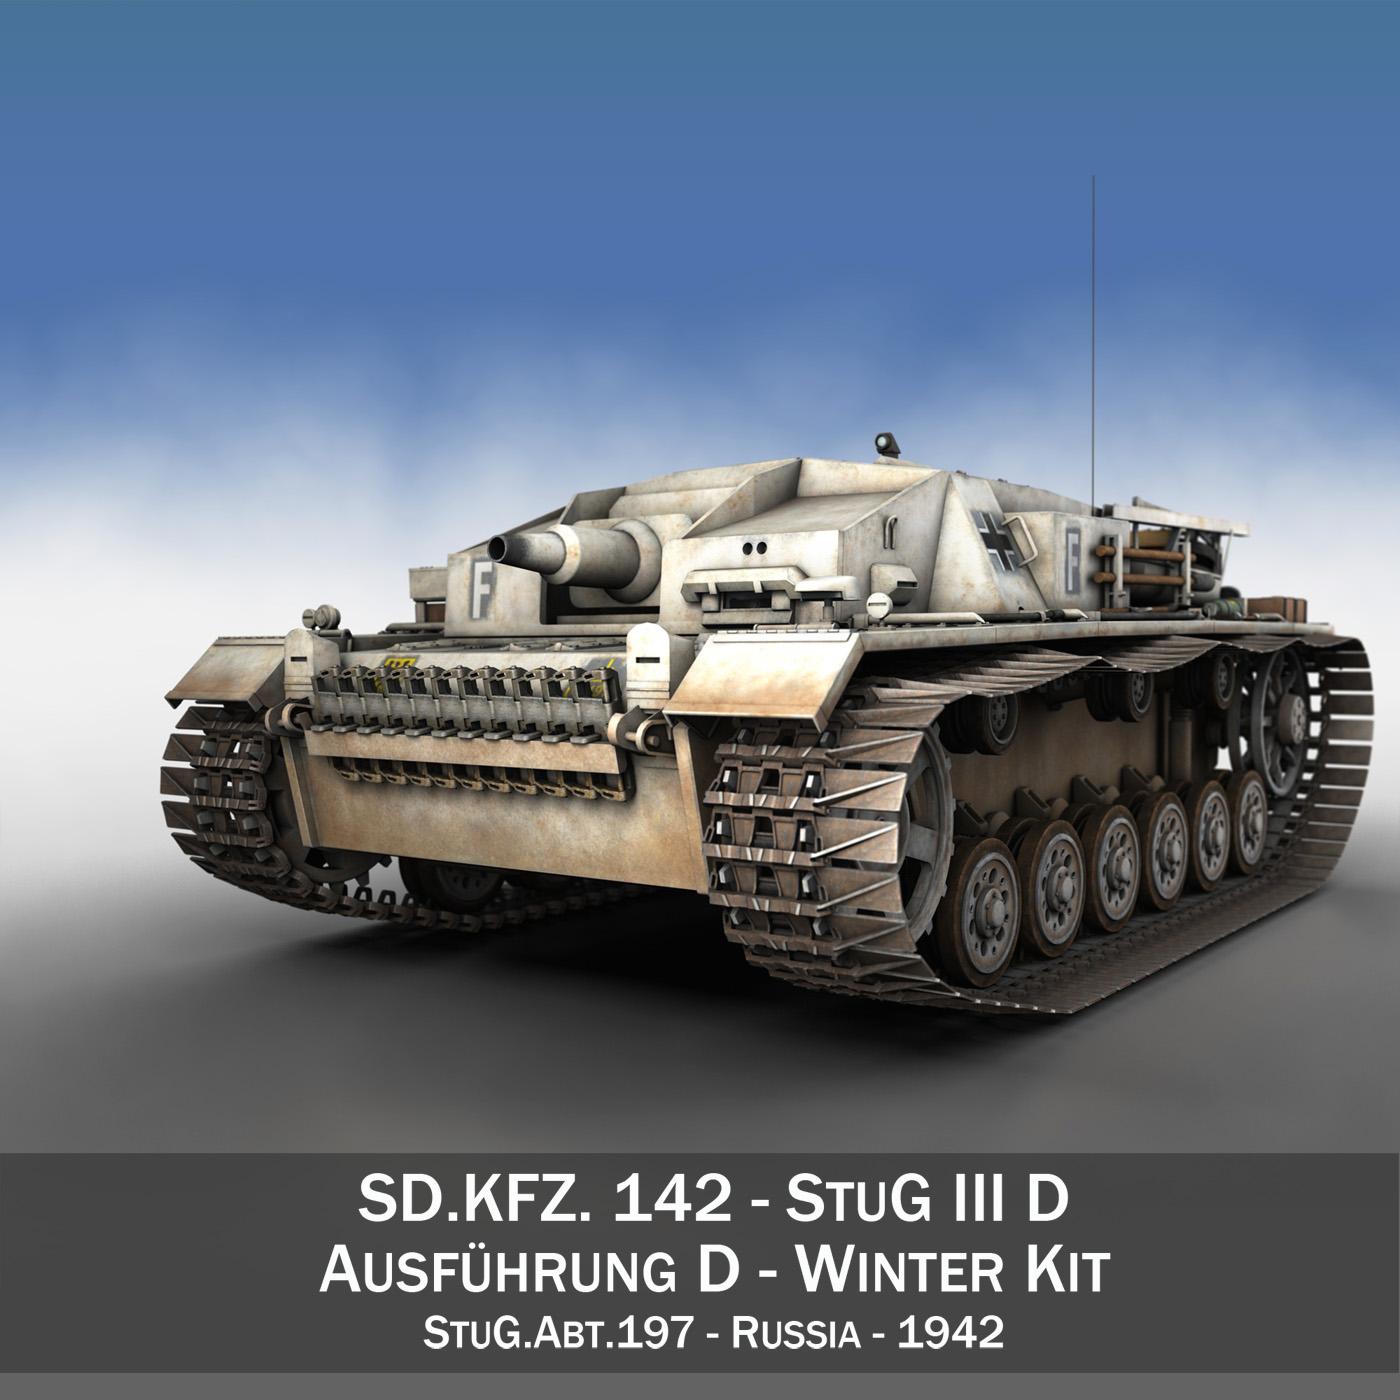 stug iii – ausf.d – stug.abt. 197 3d model 3ds fbx c4d lwo obj 278084